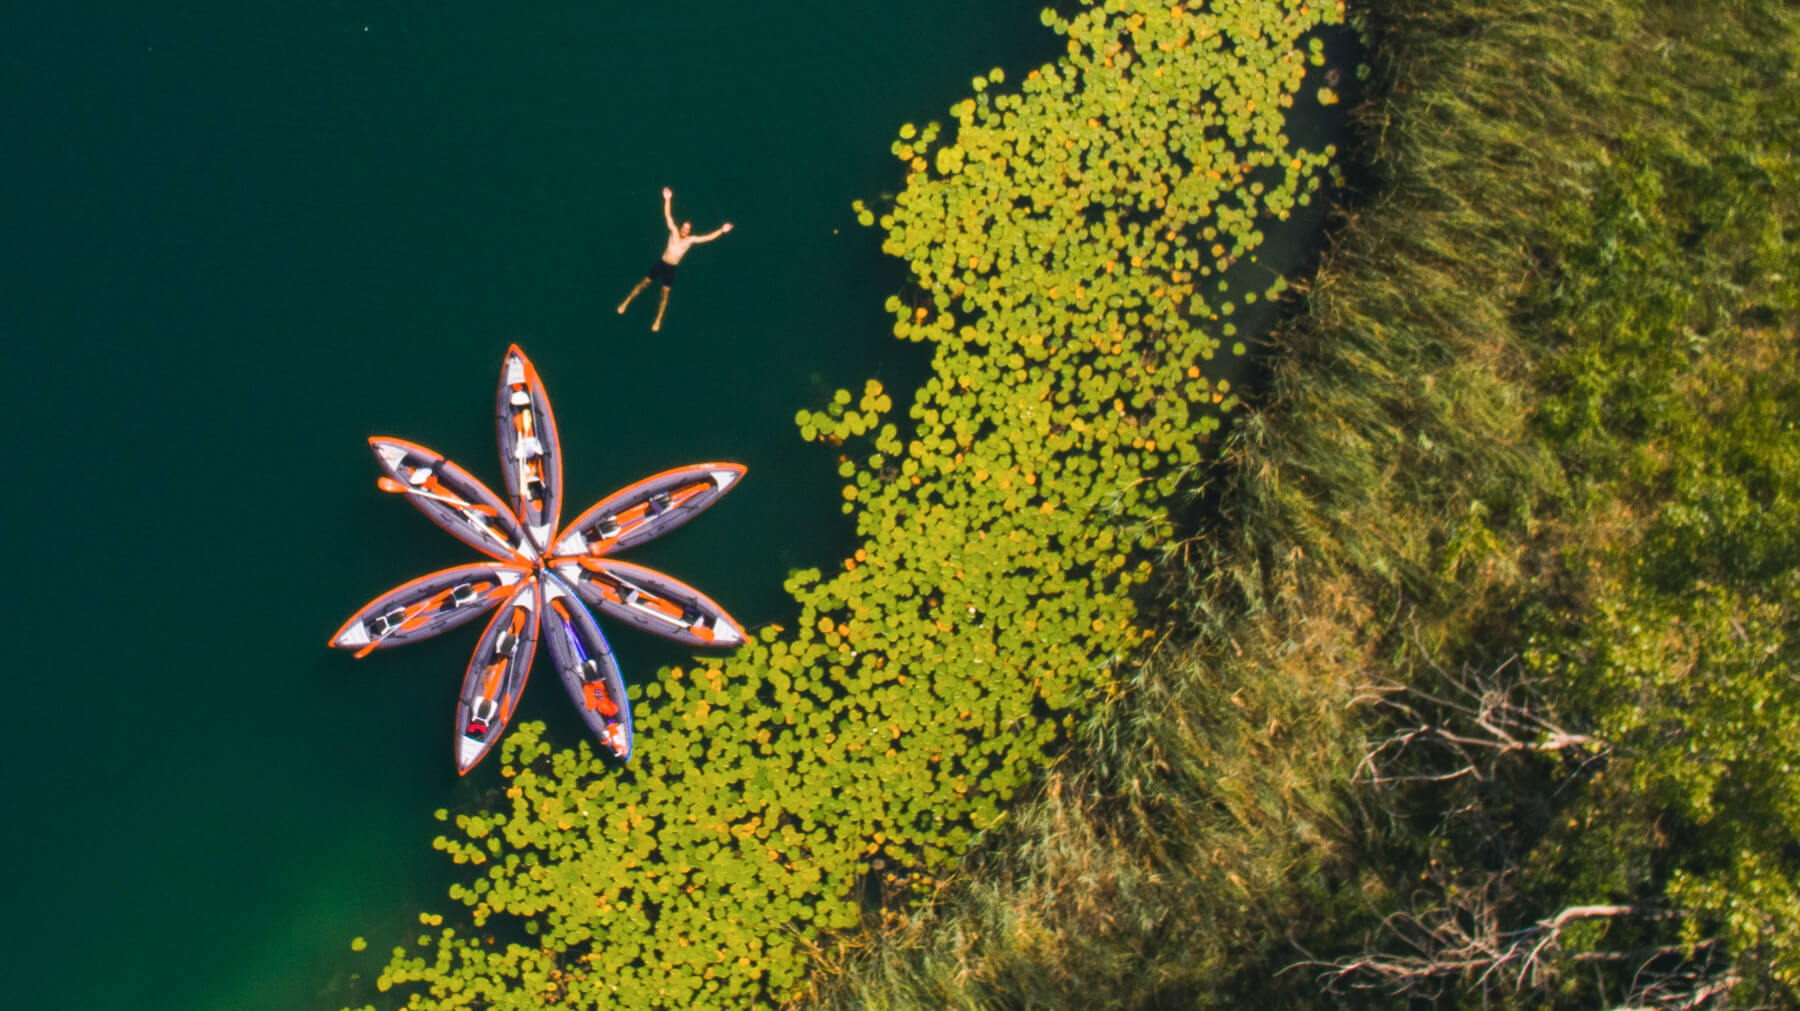 itiwit-kayaks-on-bacina-lakes